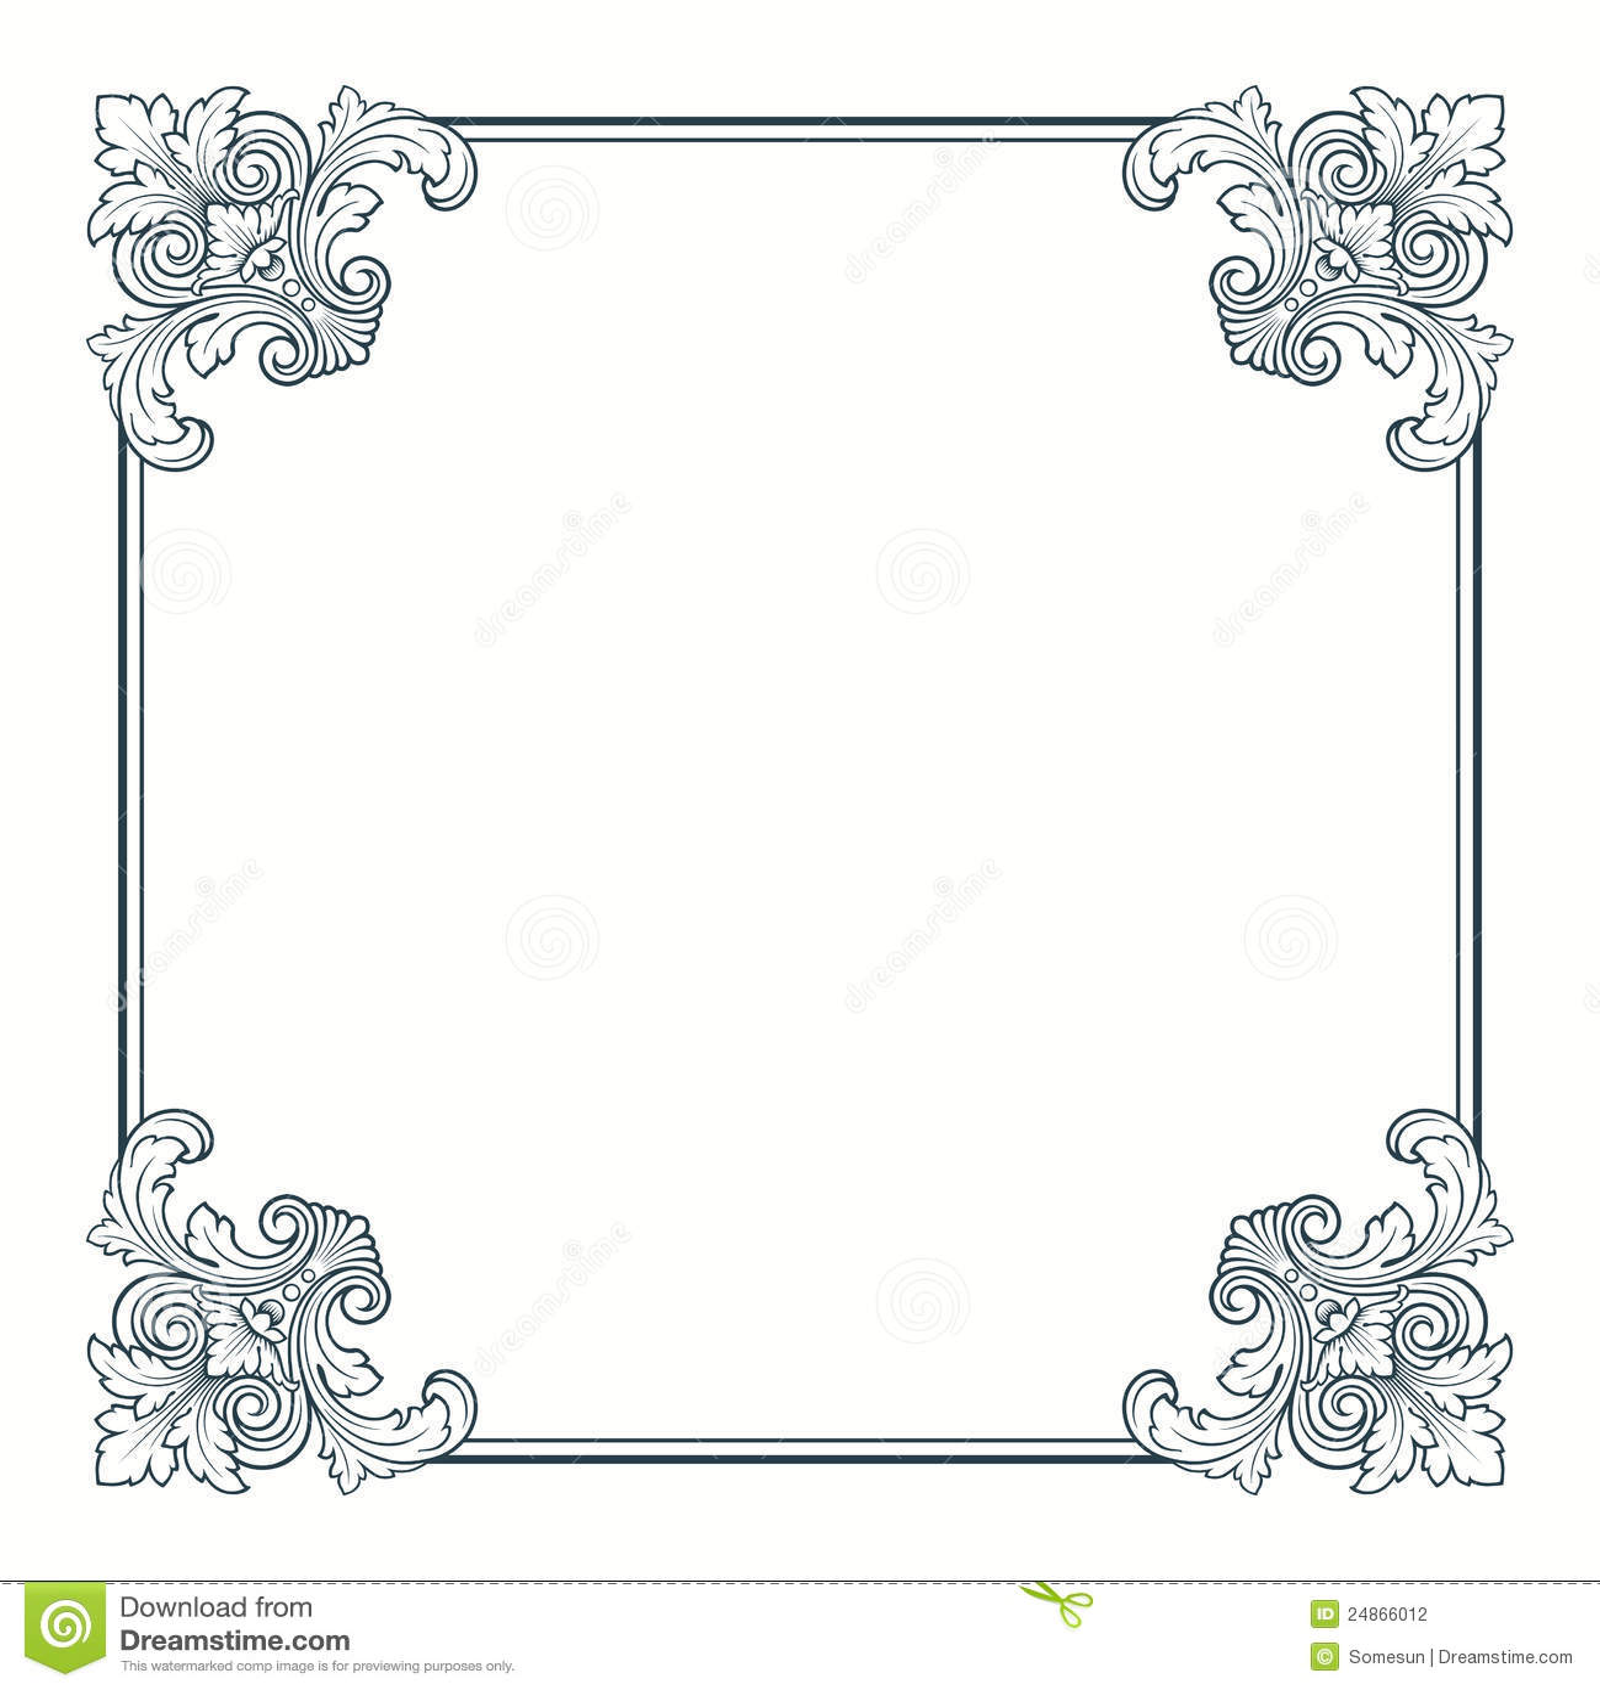 Vector Calligraphic Ornate Vintage Frame Border Stock